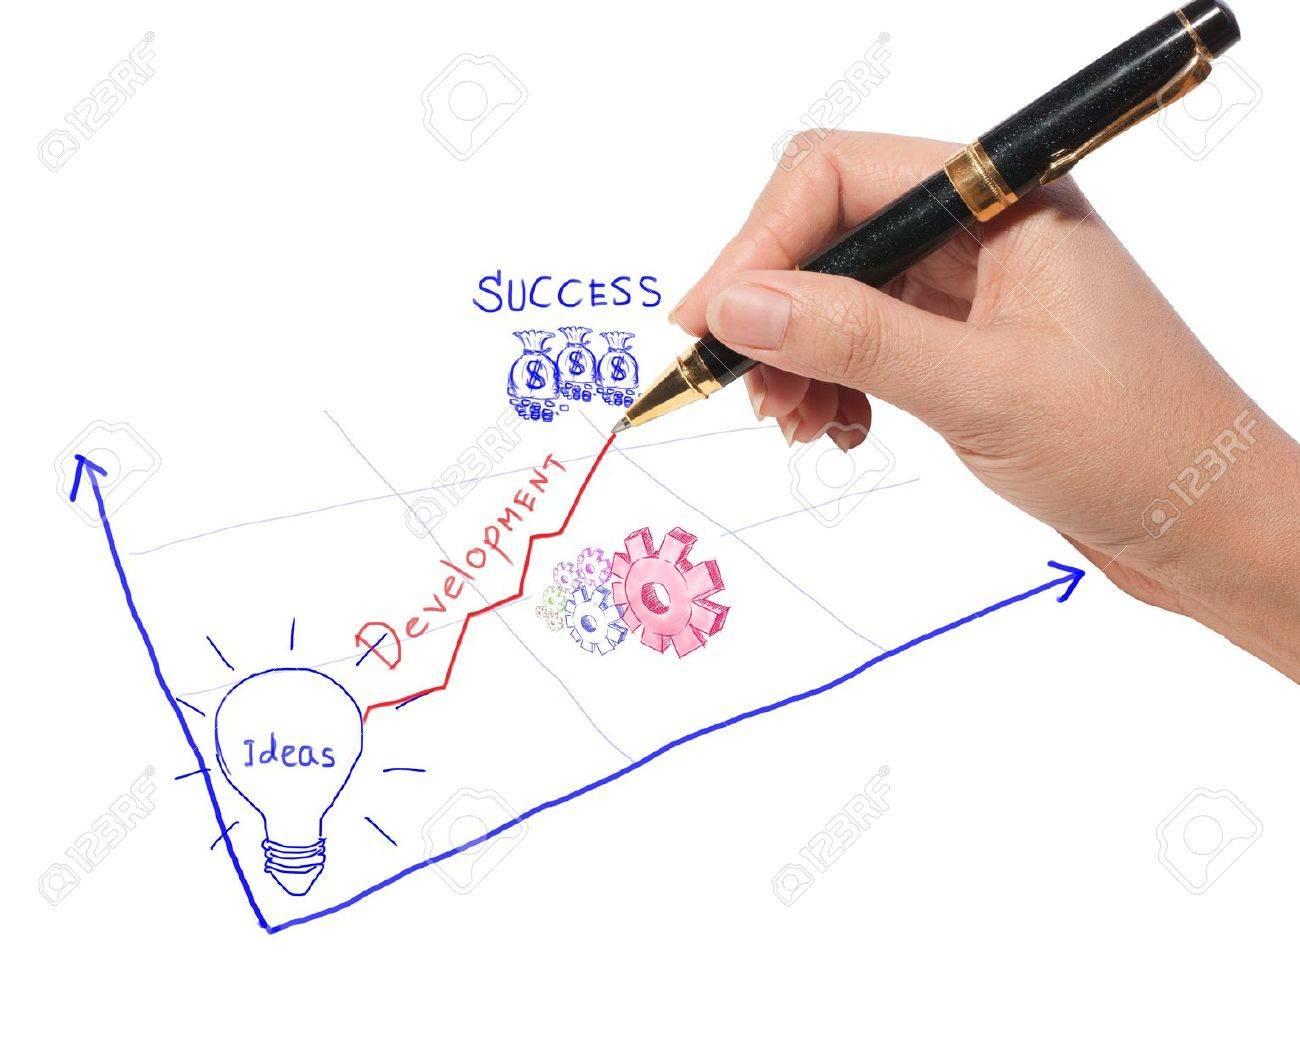 Develop business